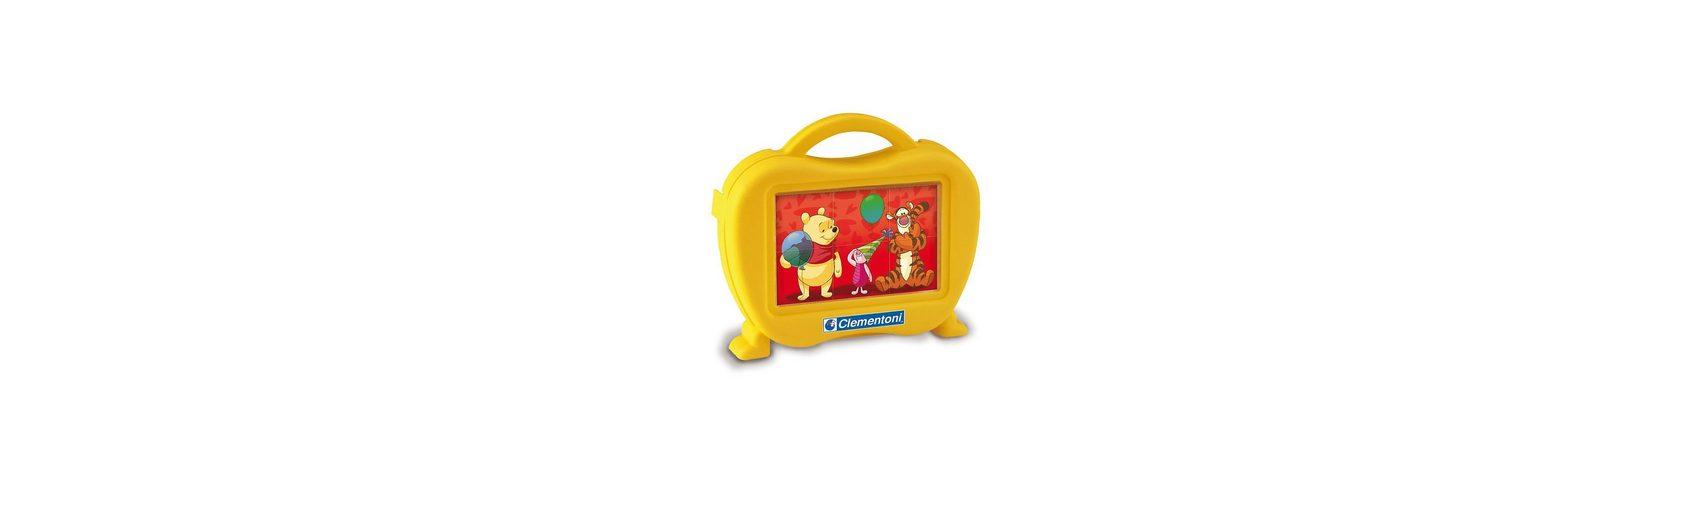 Clementoni Würfelpuzzle - 6er Winnie the Pooh